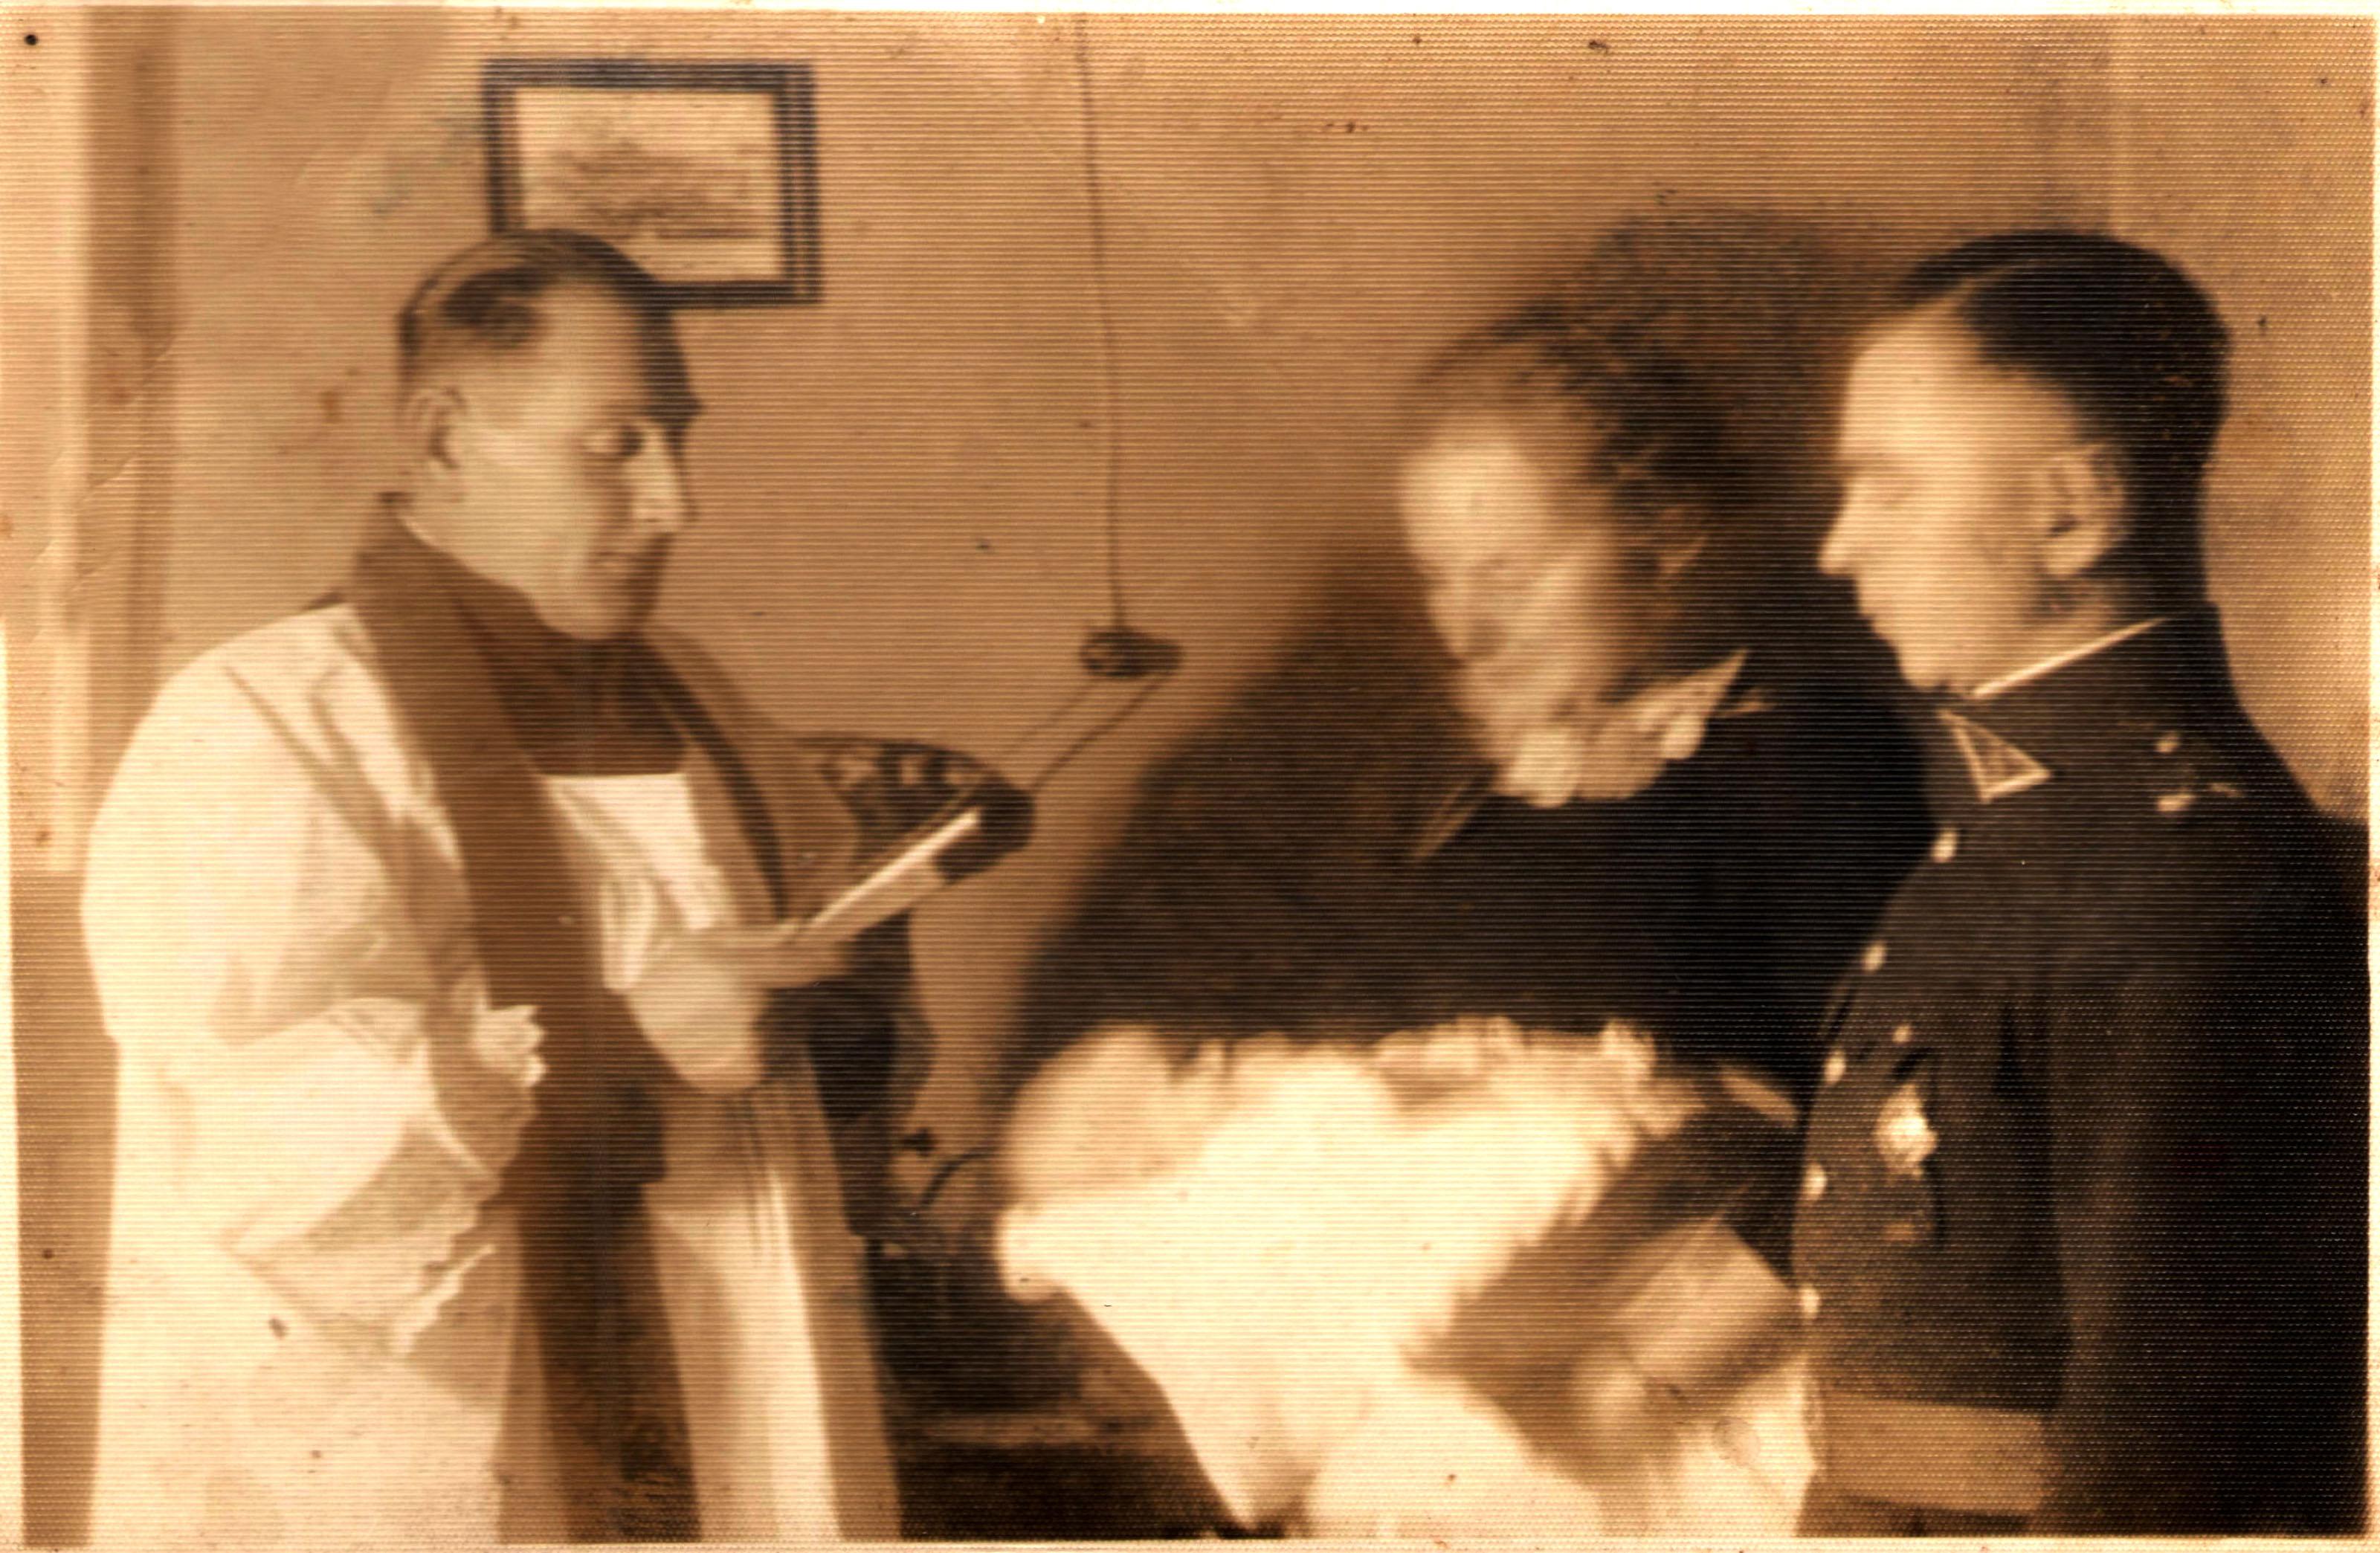 Ritutės krikštynos.2 1938 m